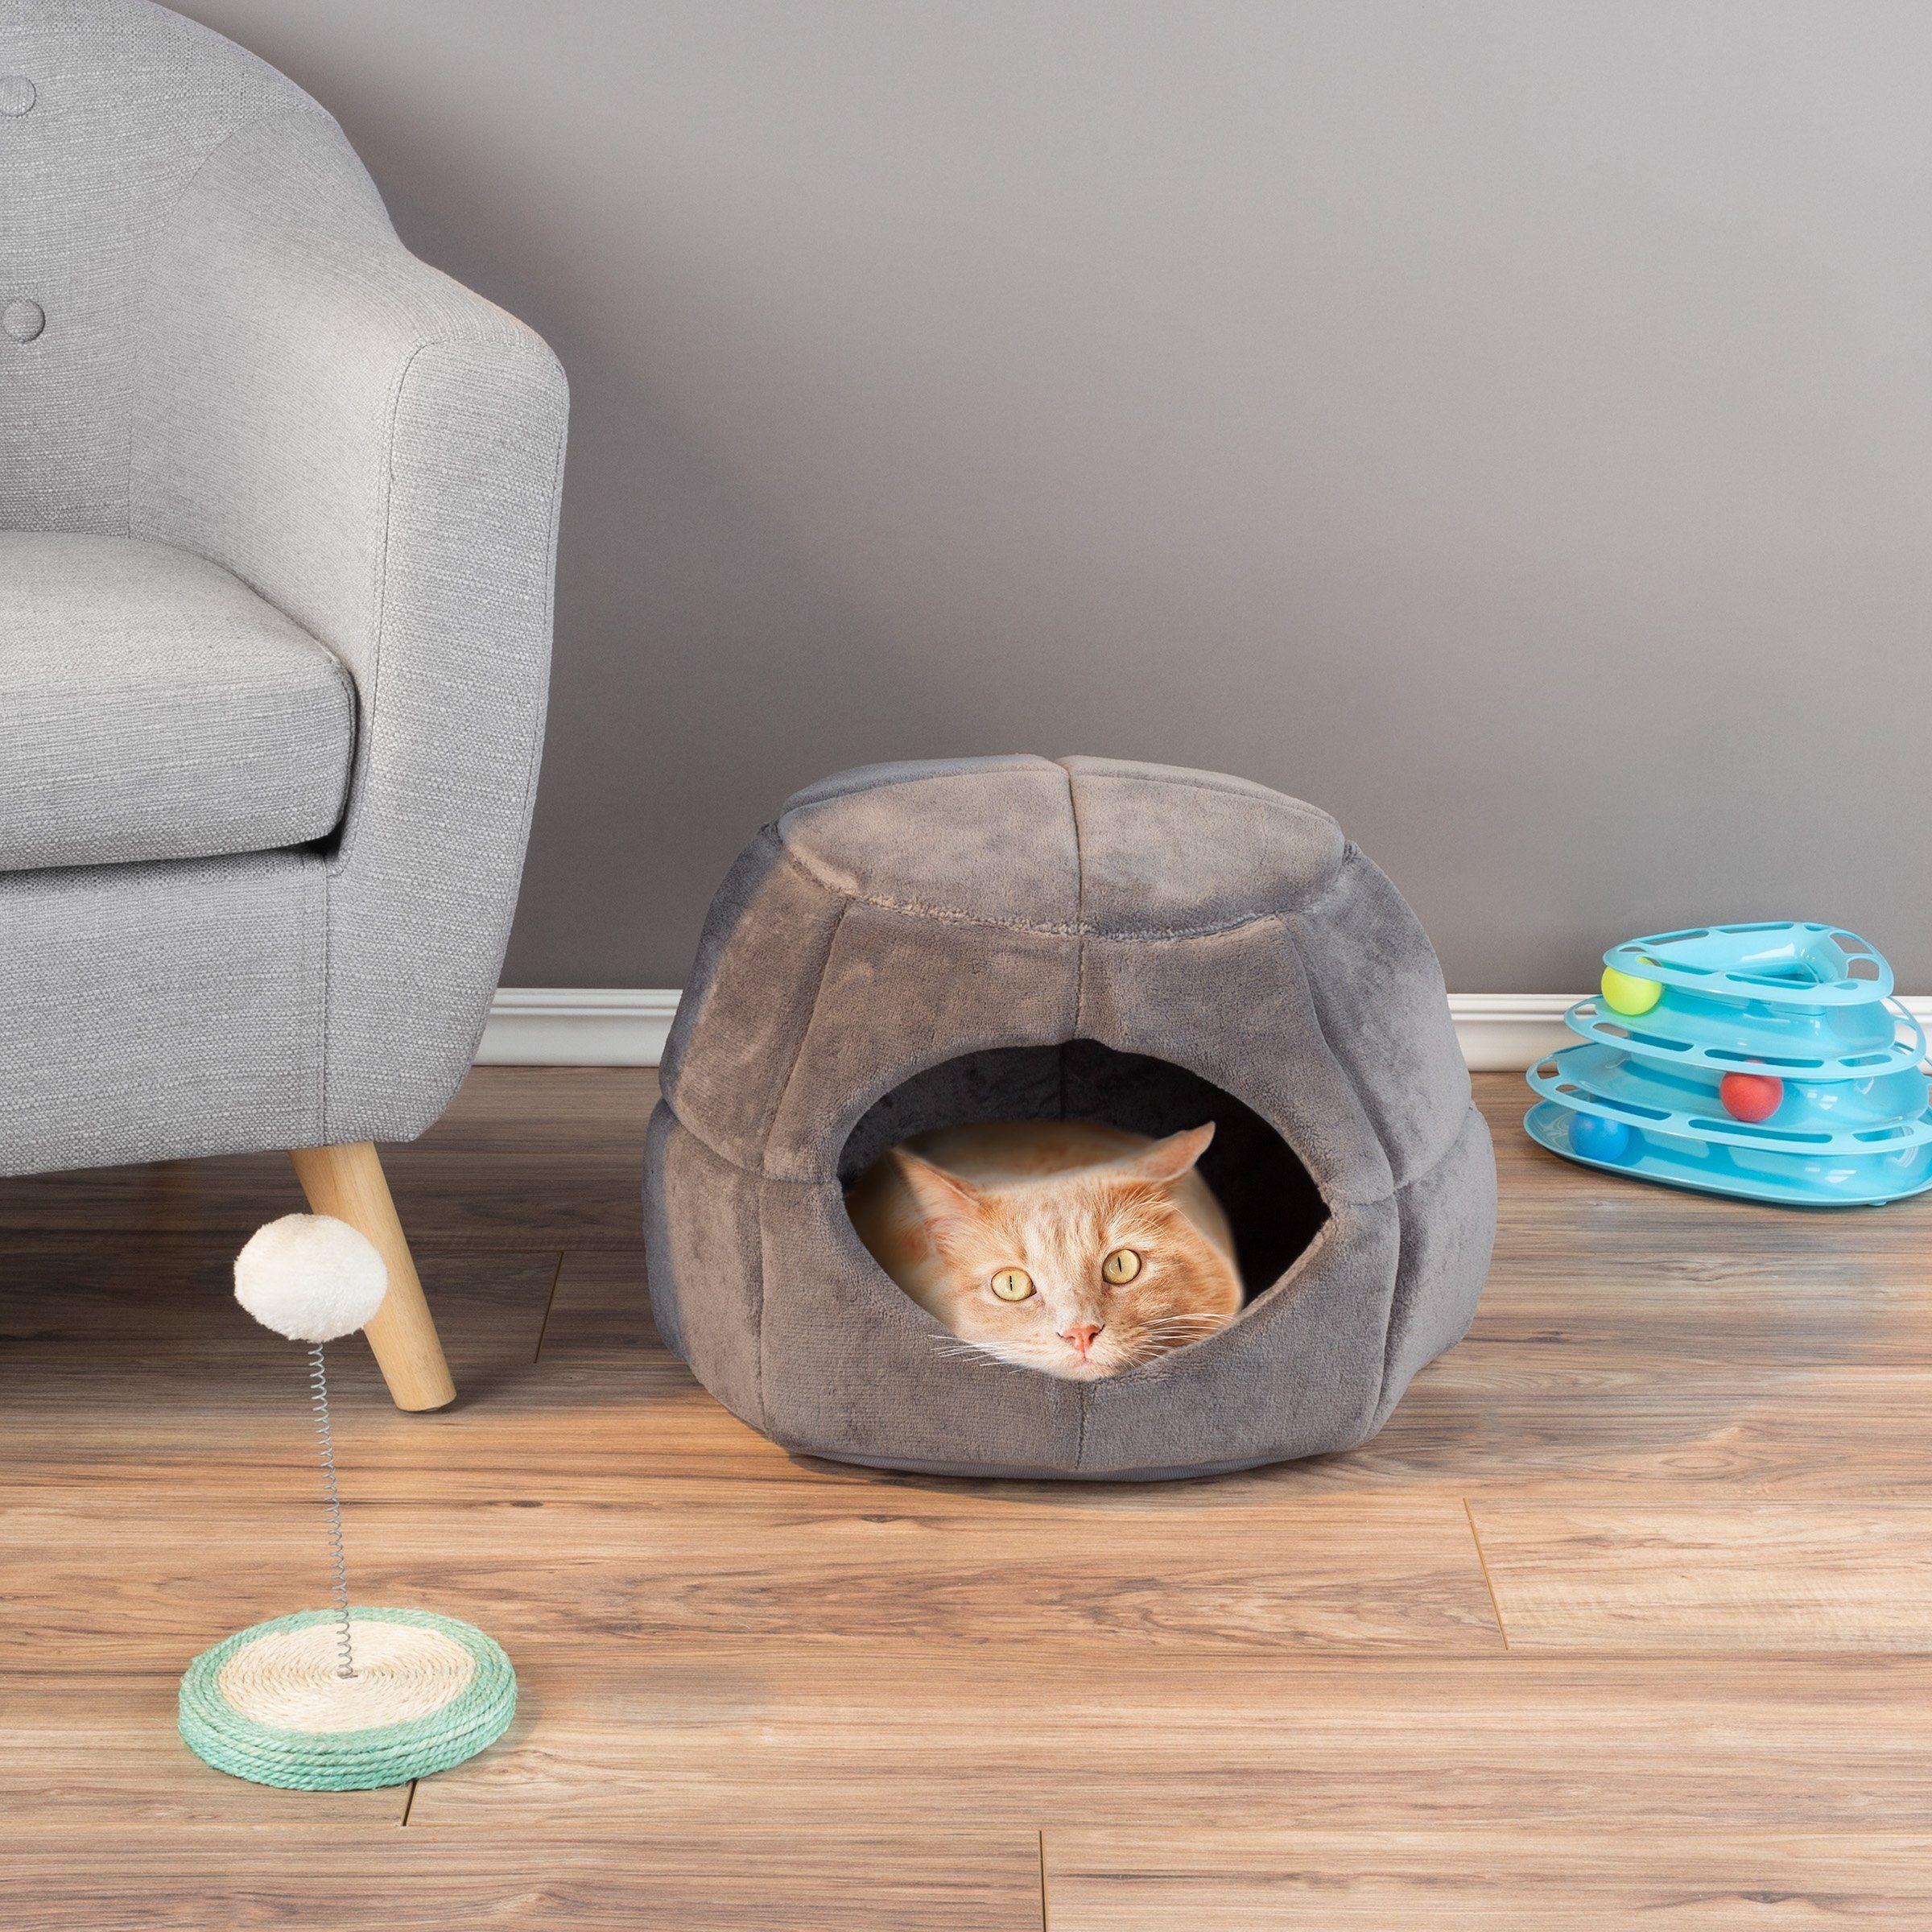 PETMAKER 2 in 1 Convertible Pet Bed Cat Kitten or Small